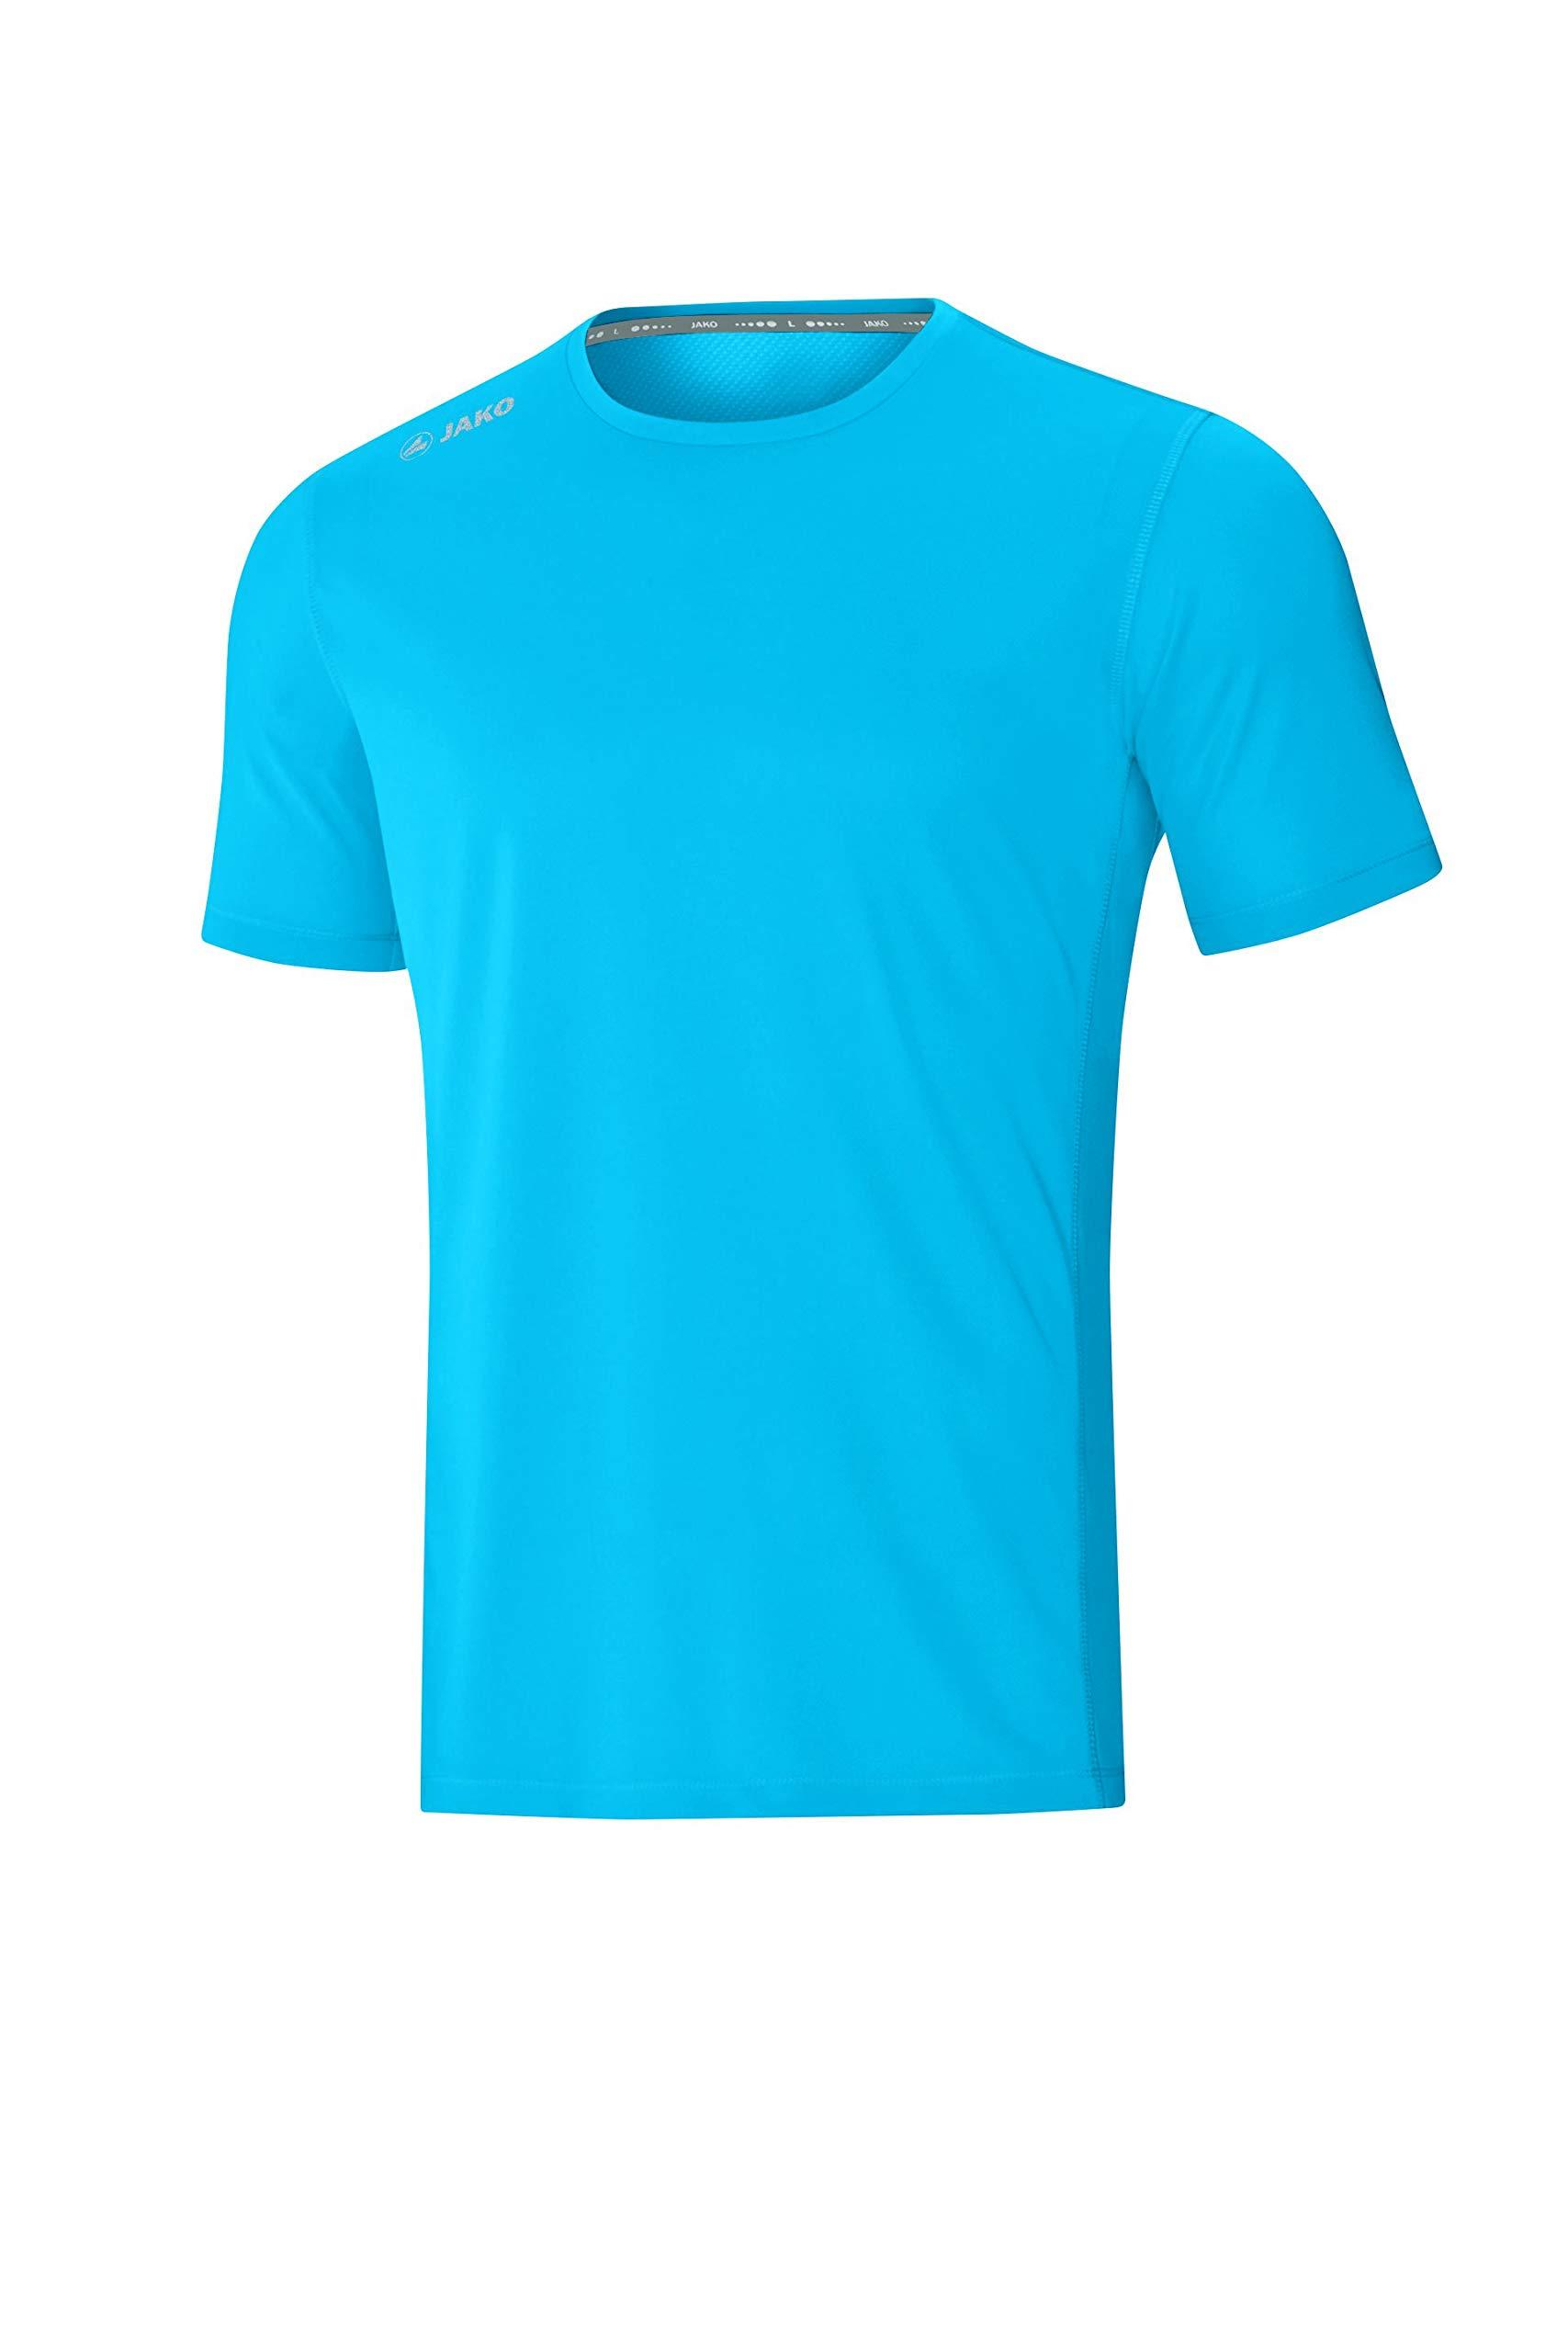 JAKO Kinder Run 2.0 T-Shirt, blau, 128